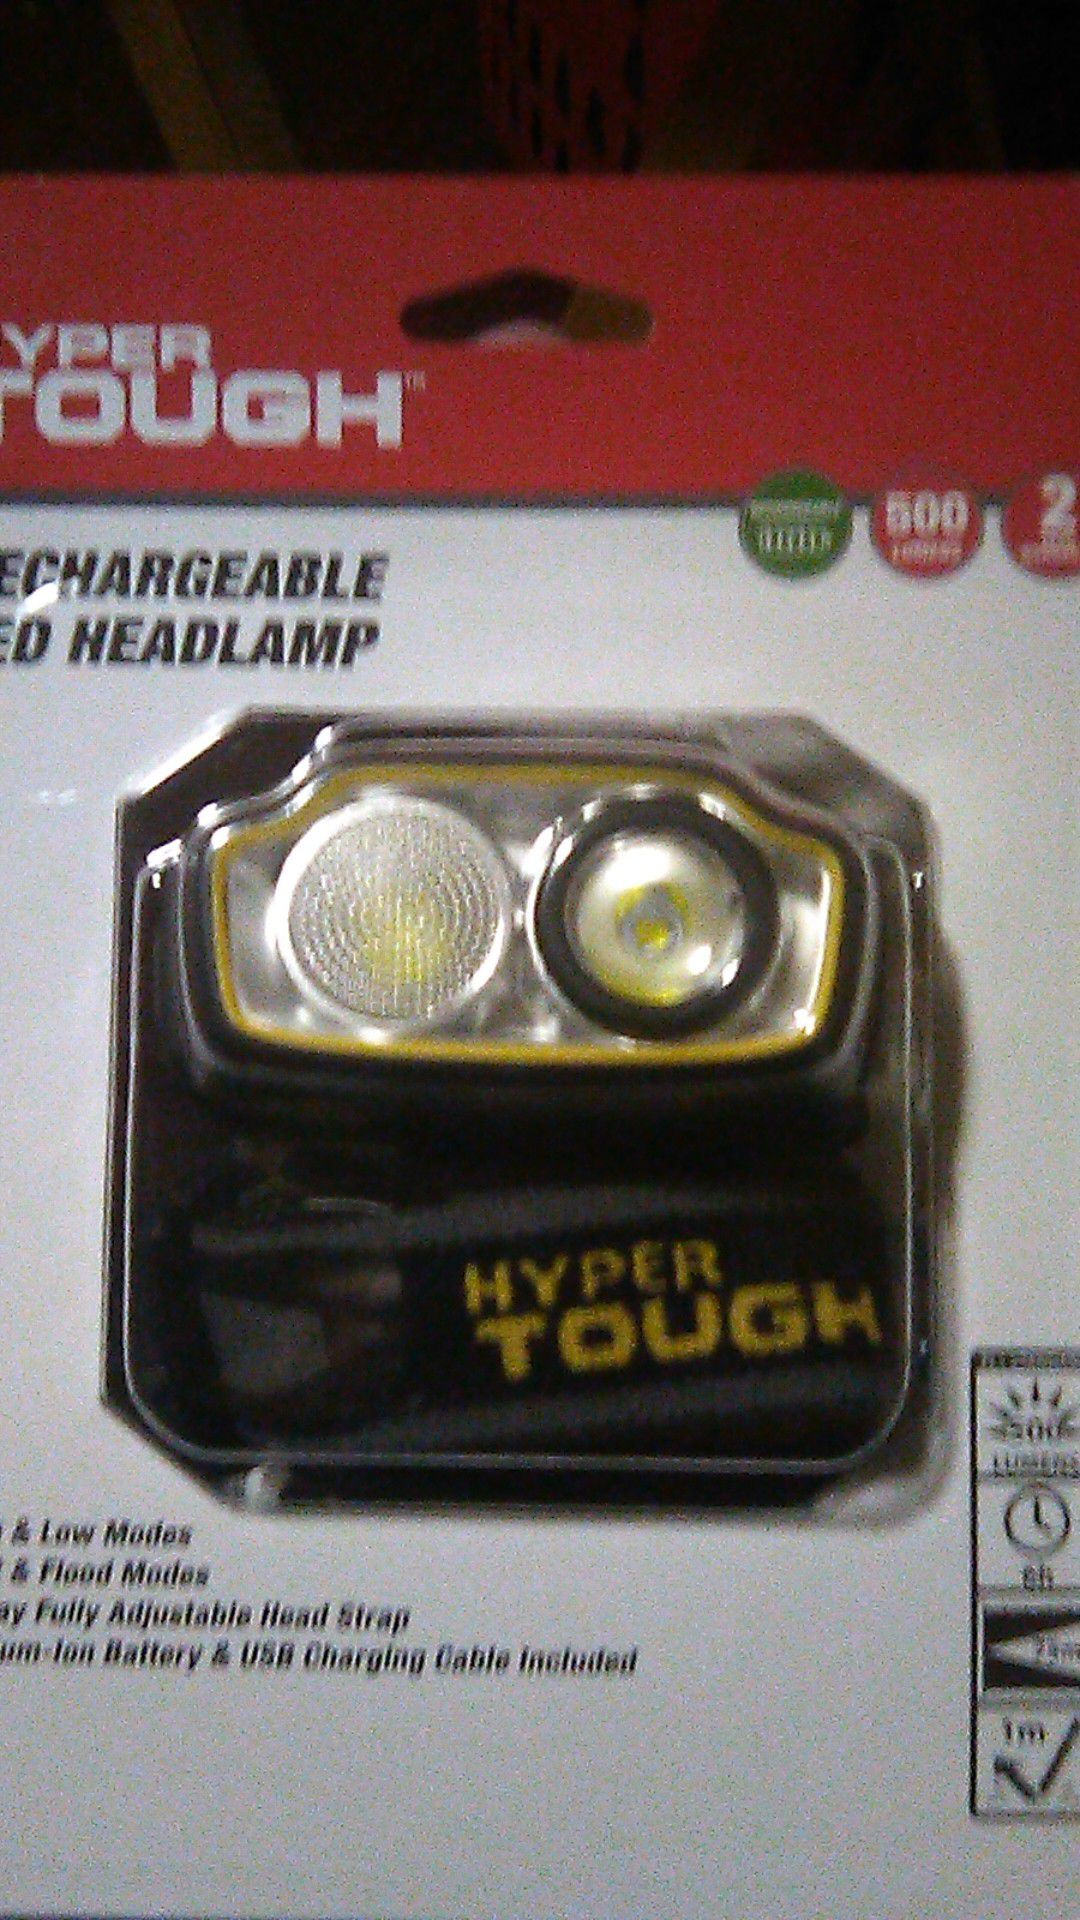 Hyper tough rechargable head lamp